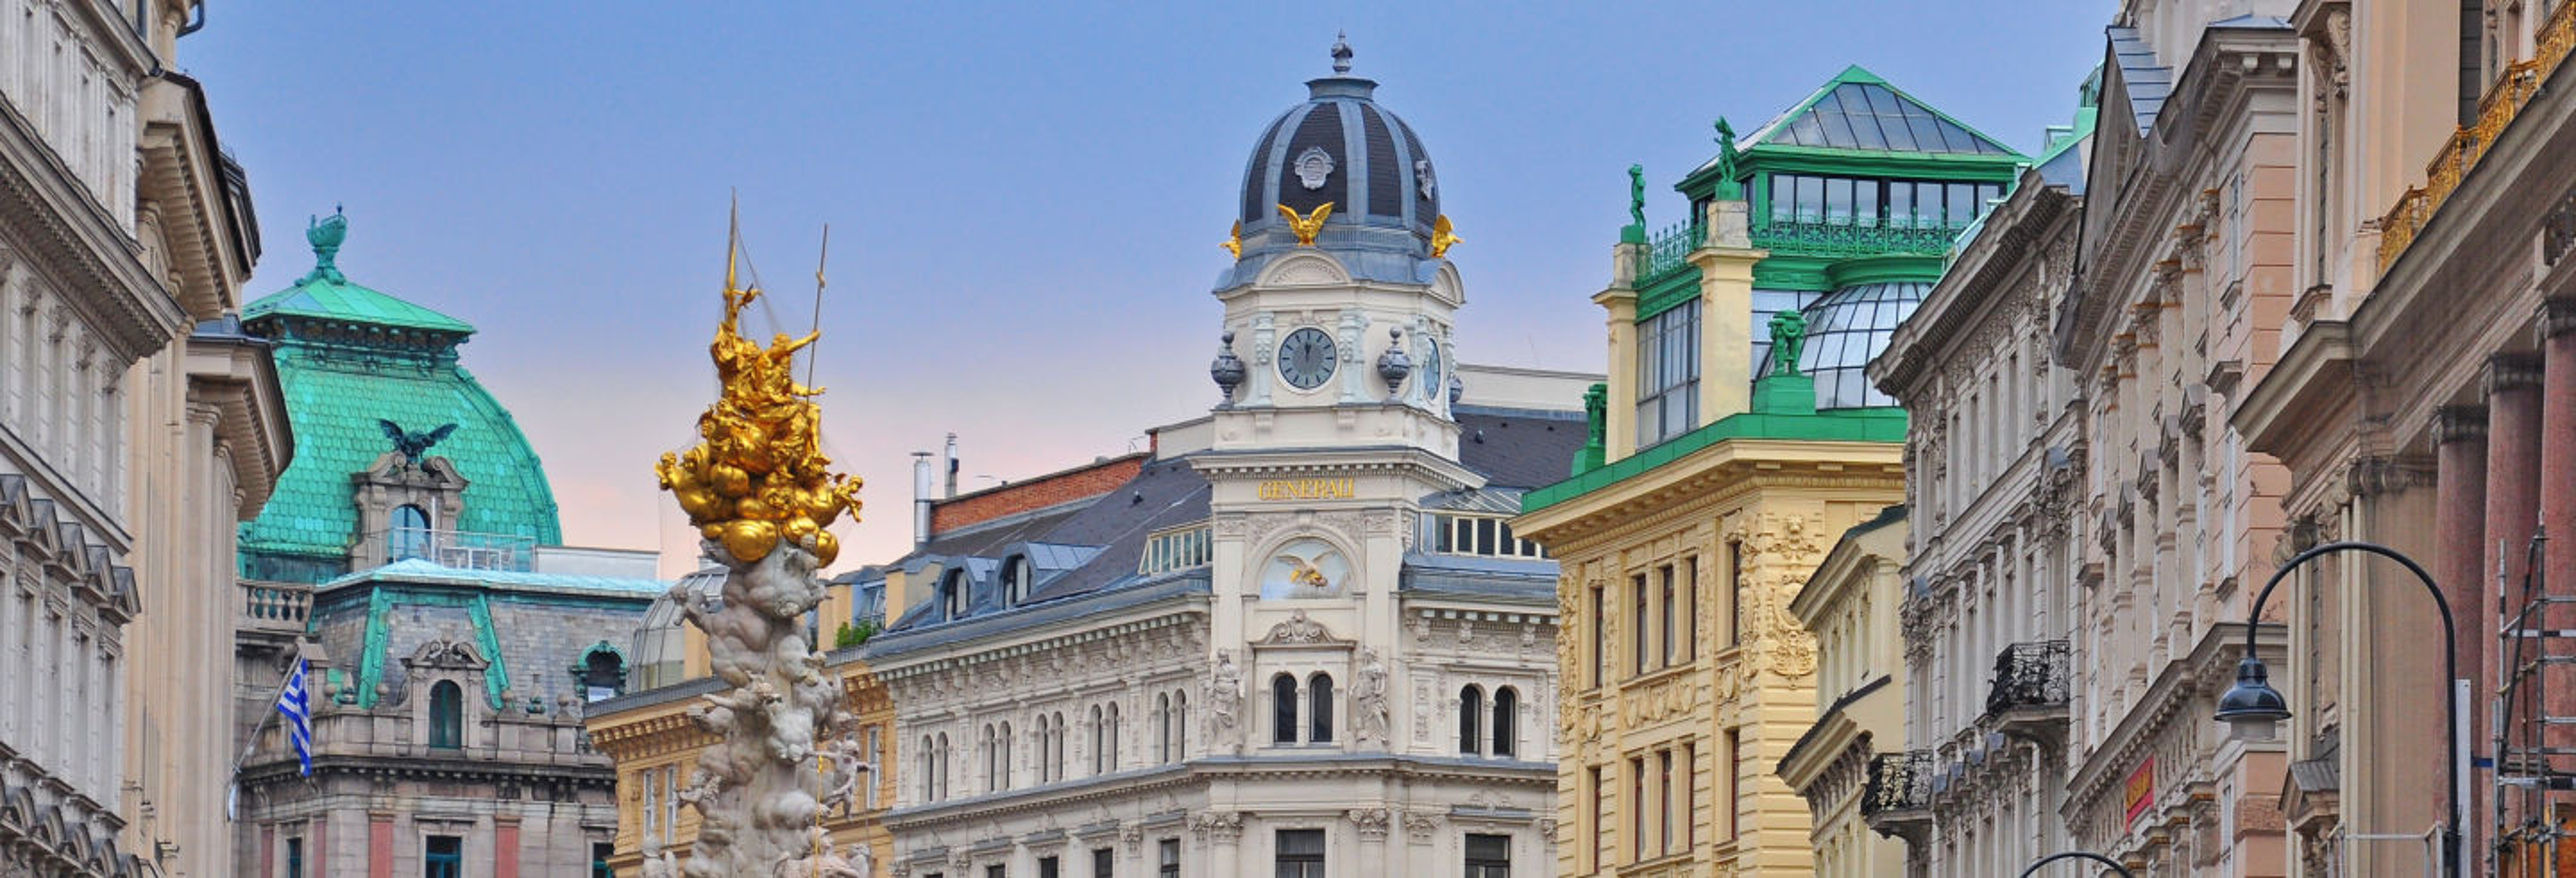 Visita guiada por Viena e pela Ópera Estatal